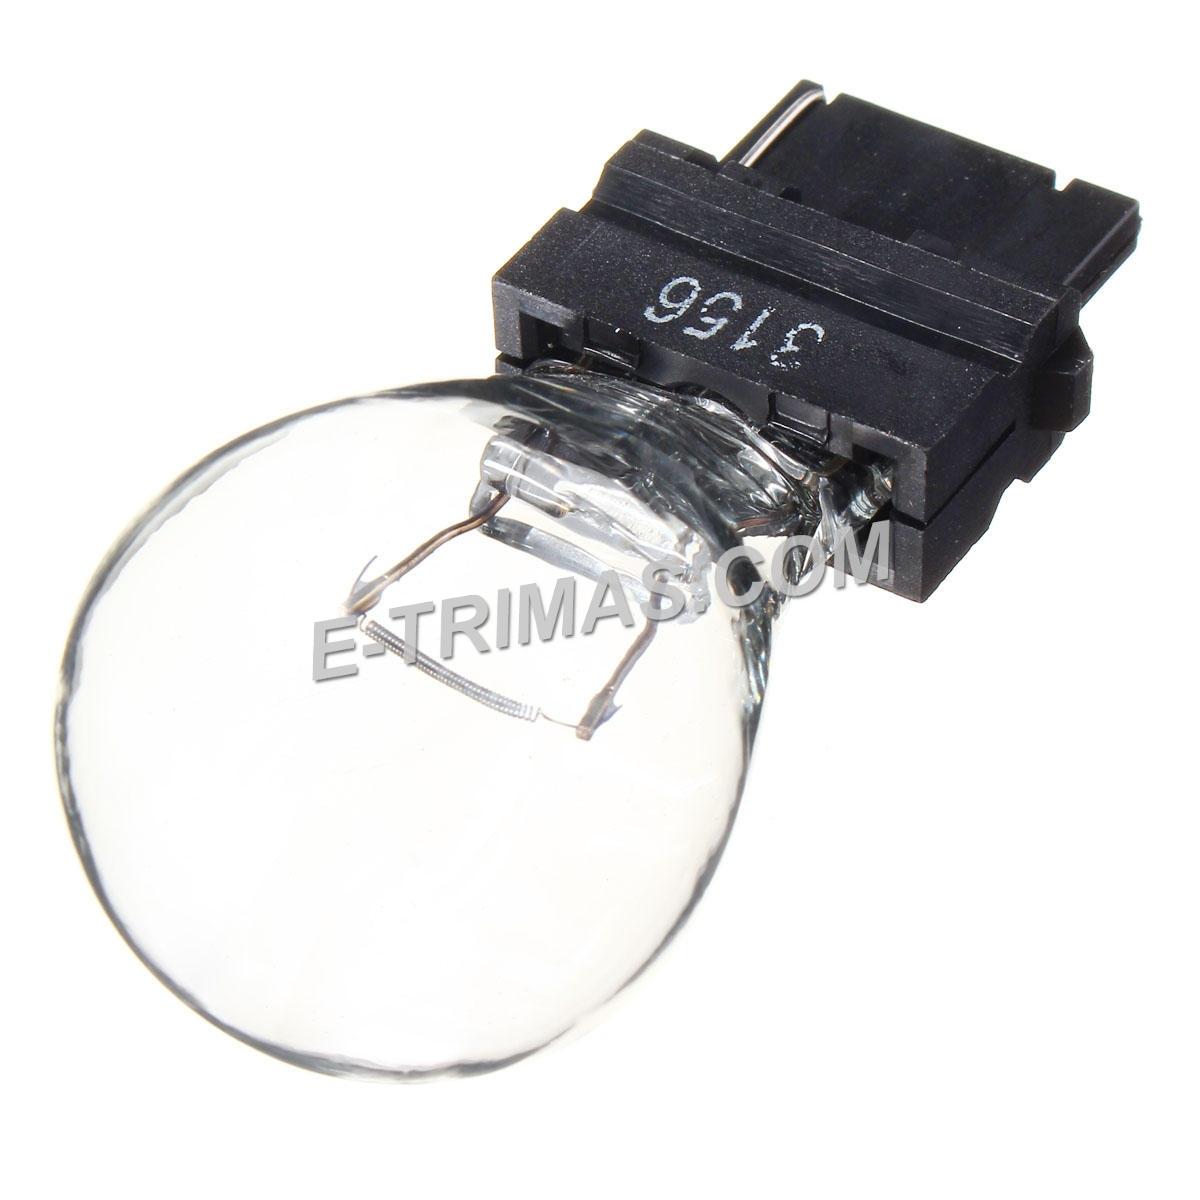 T25 3156 Car Halogen Tail Light Bulb Rear Brake Stop Turn Signal Reverse Lamp